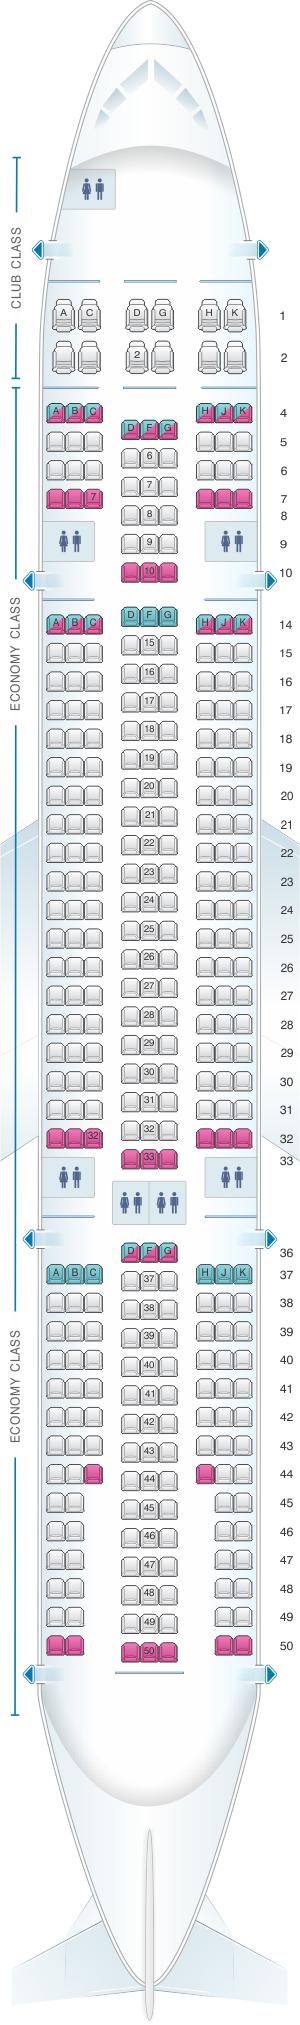 Seat Map Air Transat Airbus A330 200